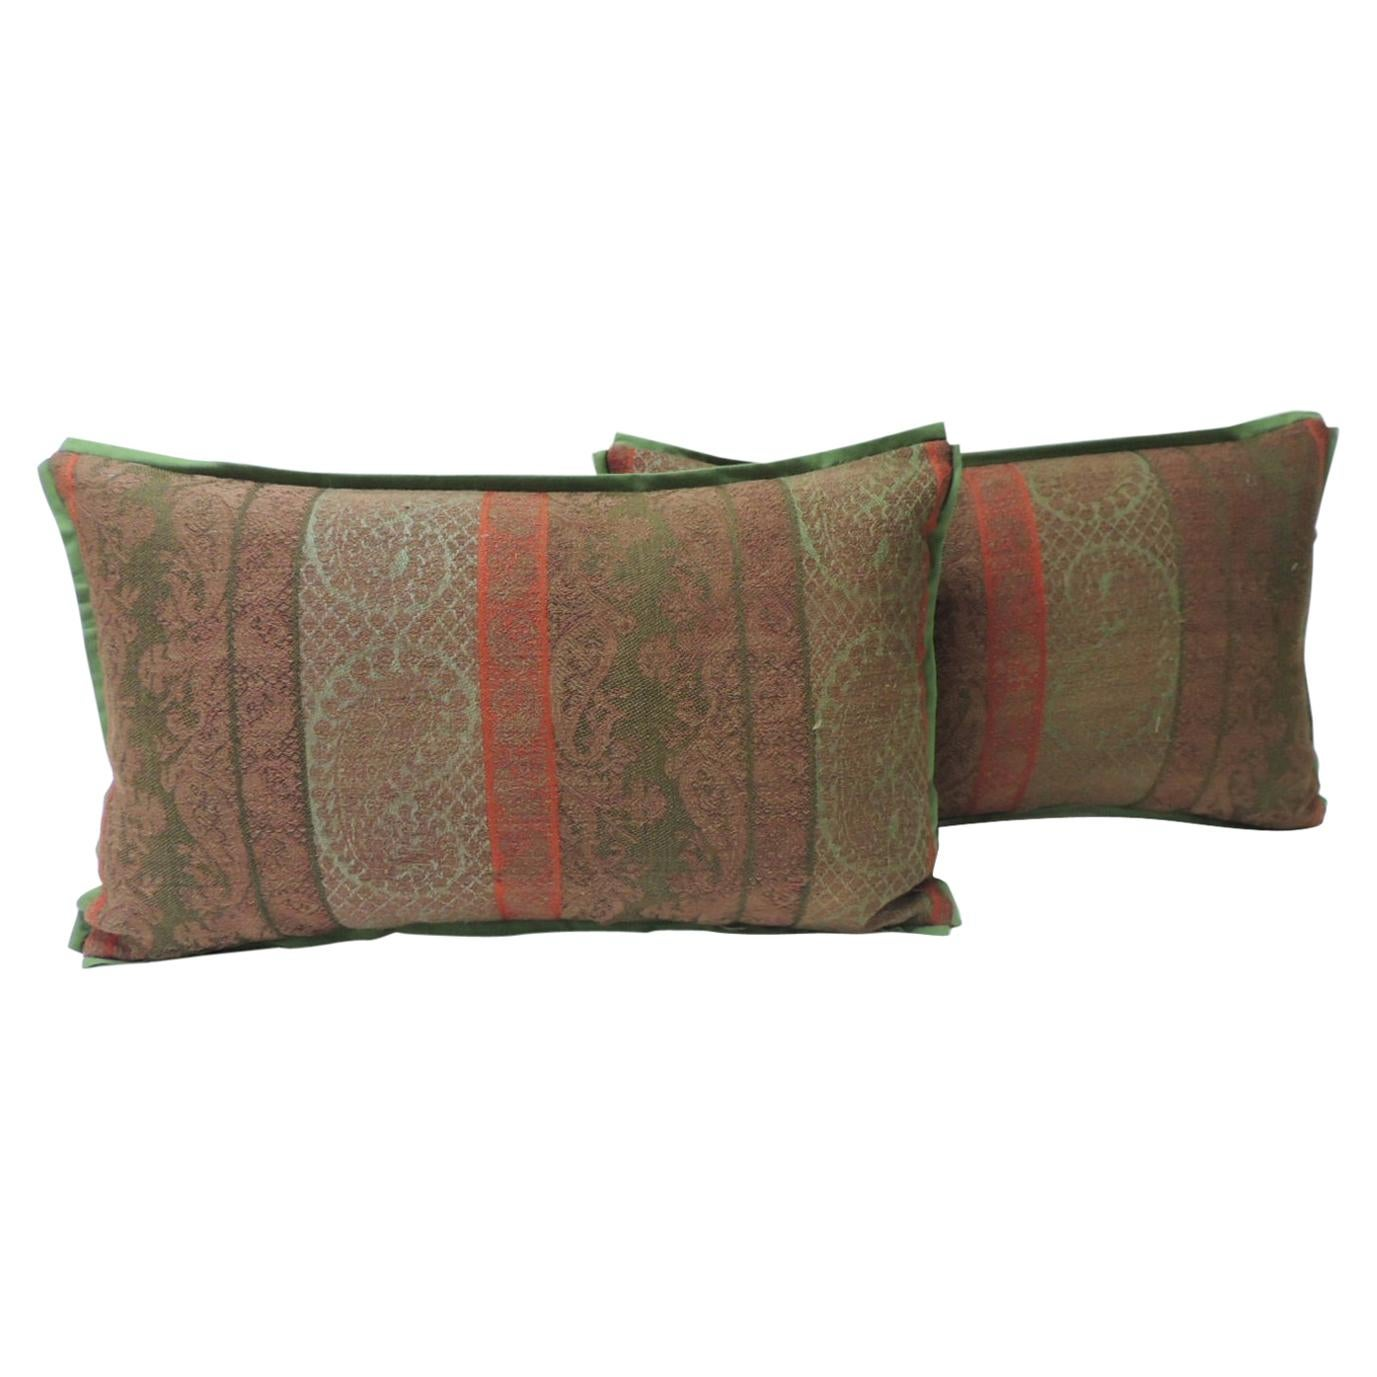 Pair of 19th Century Antique Woven Kashmir Paisley Decorative Lumbar Pillows